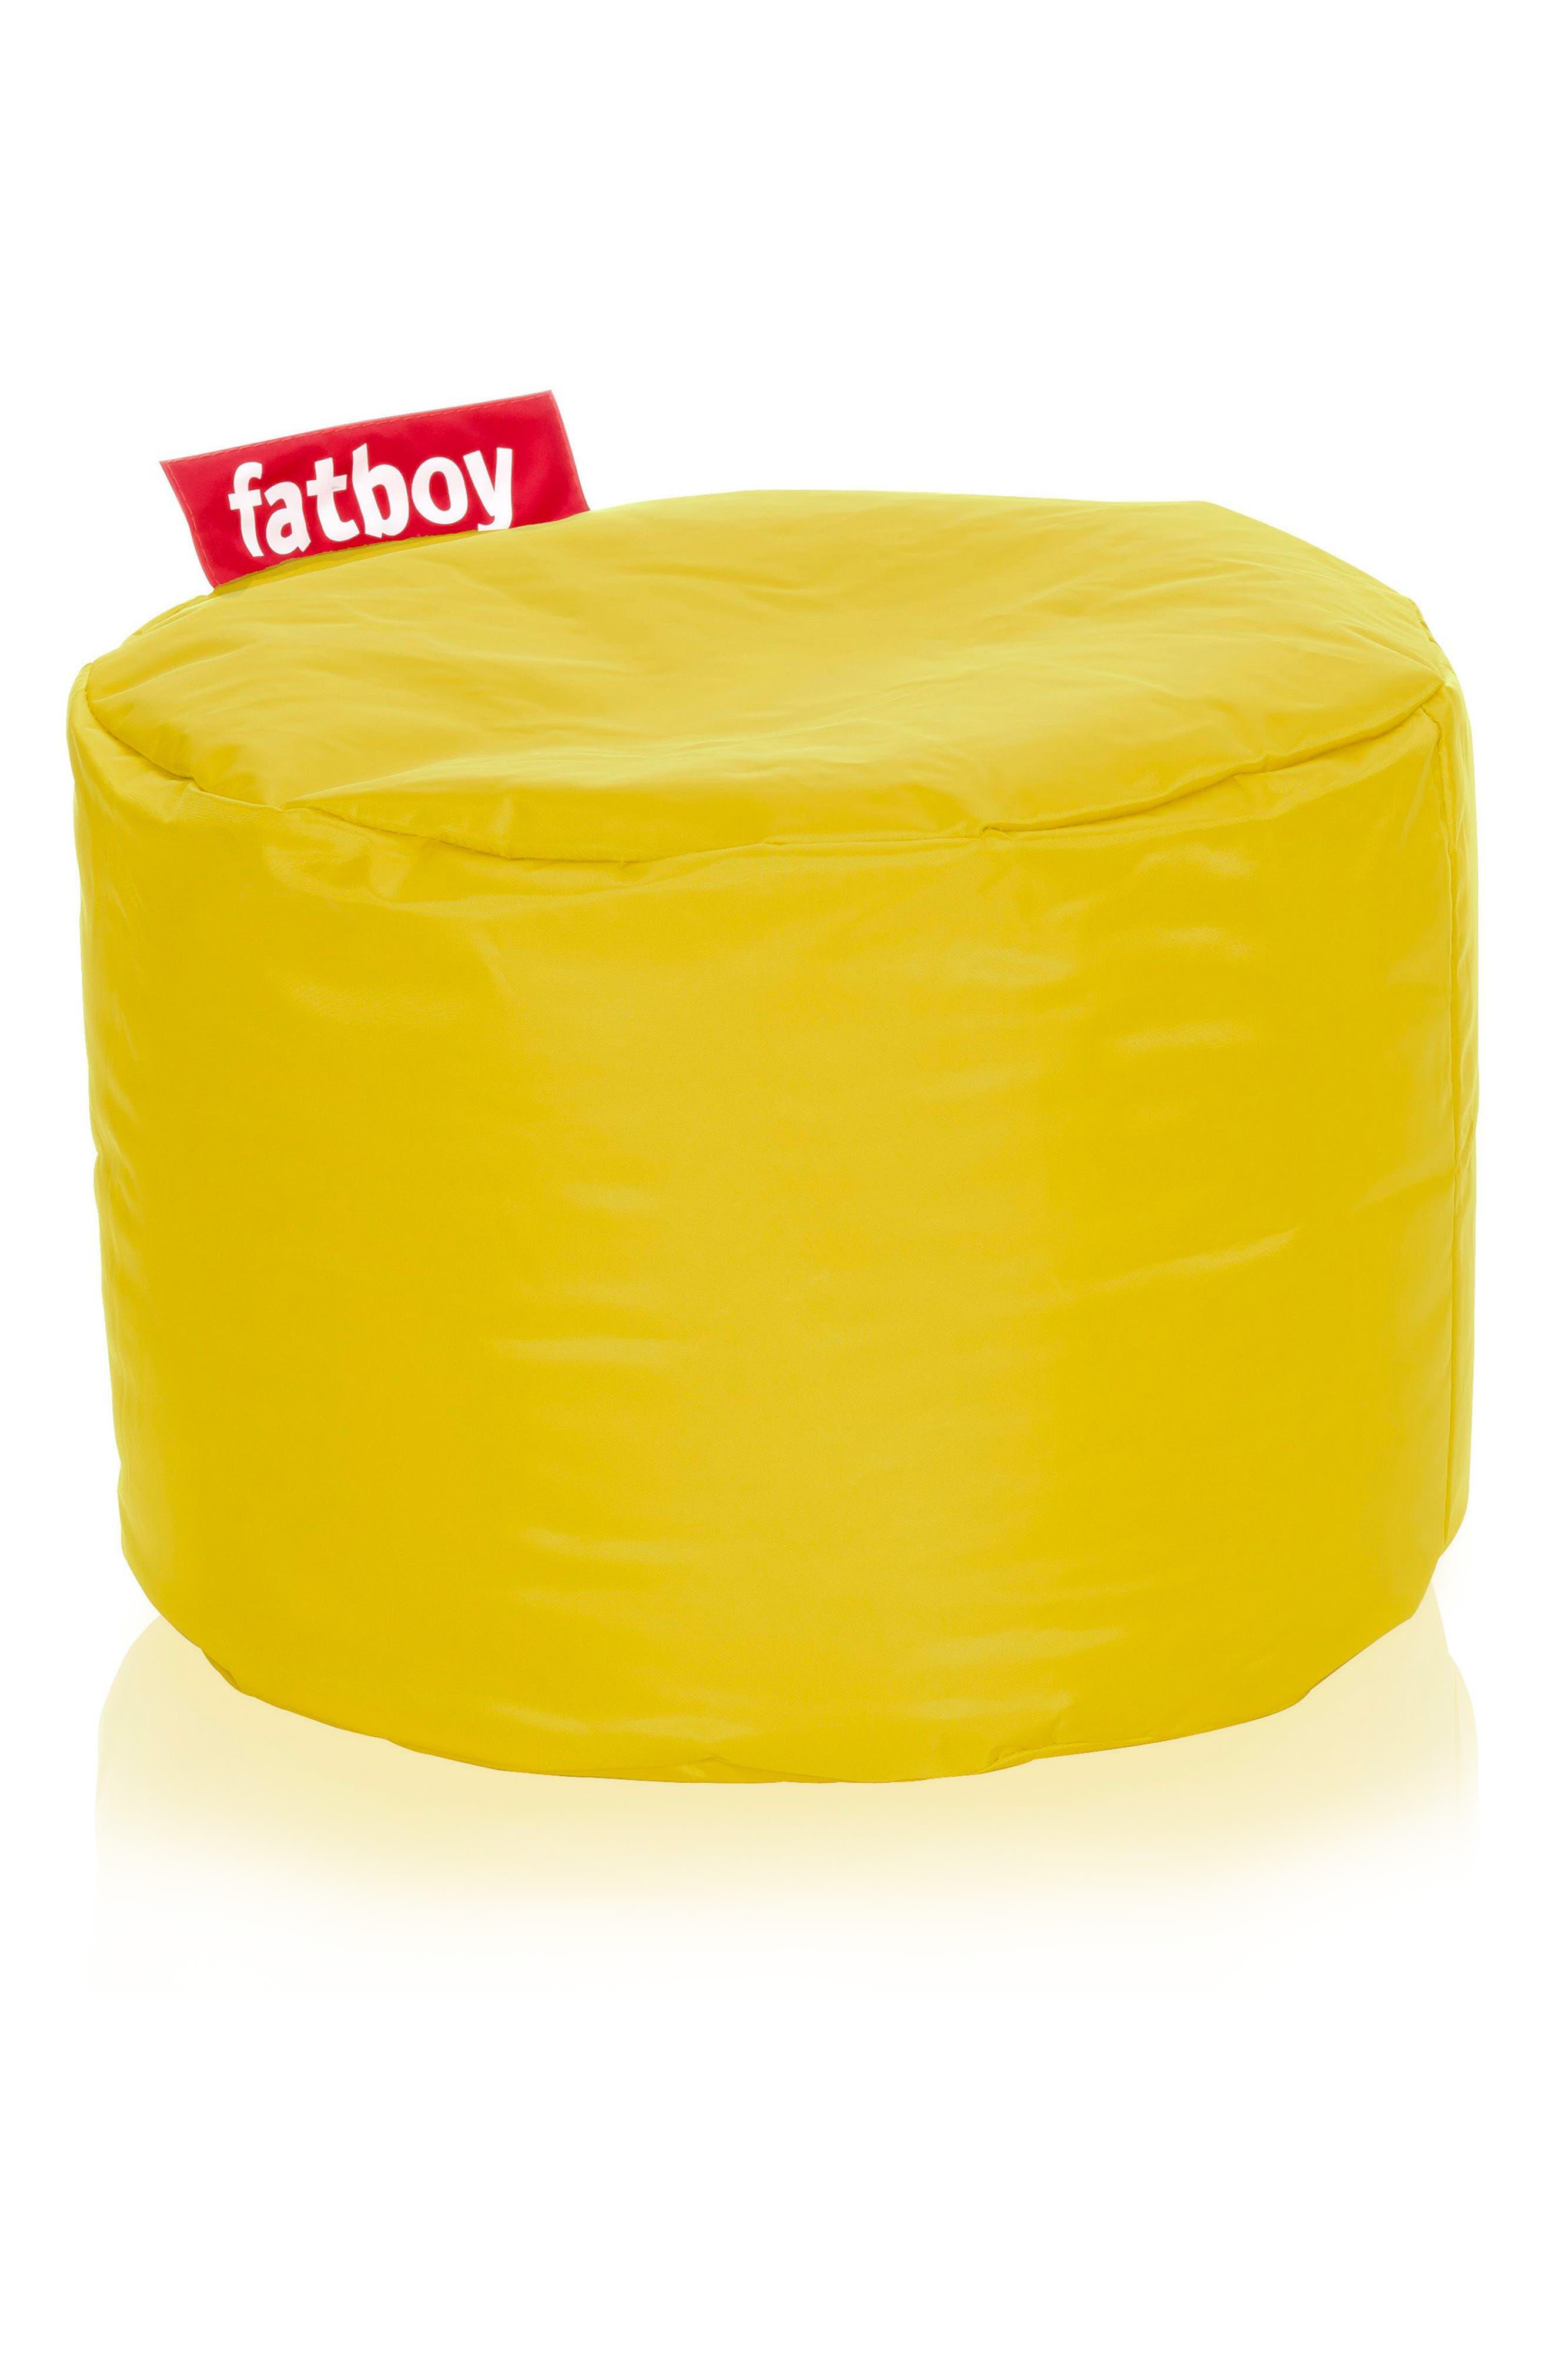 Fatboy Point Ottoman